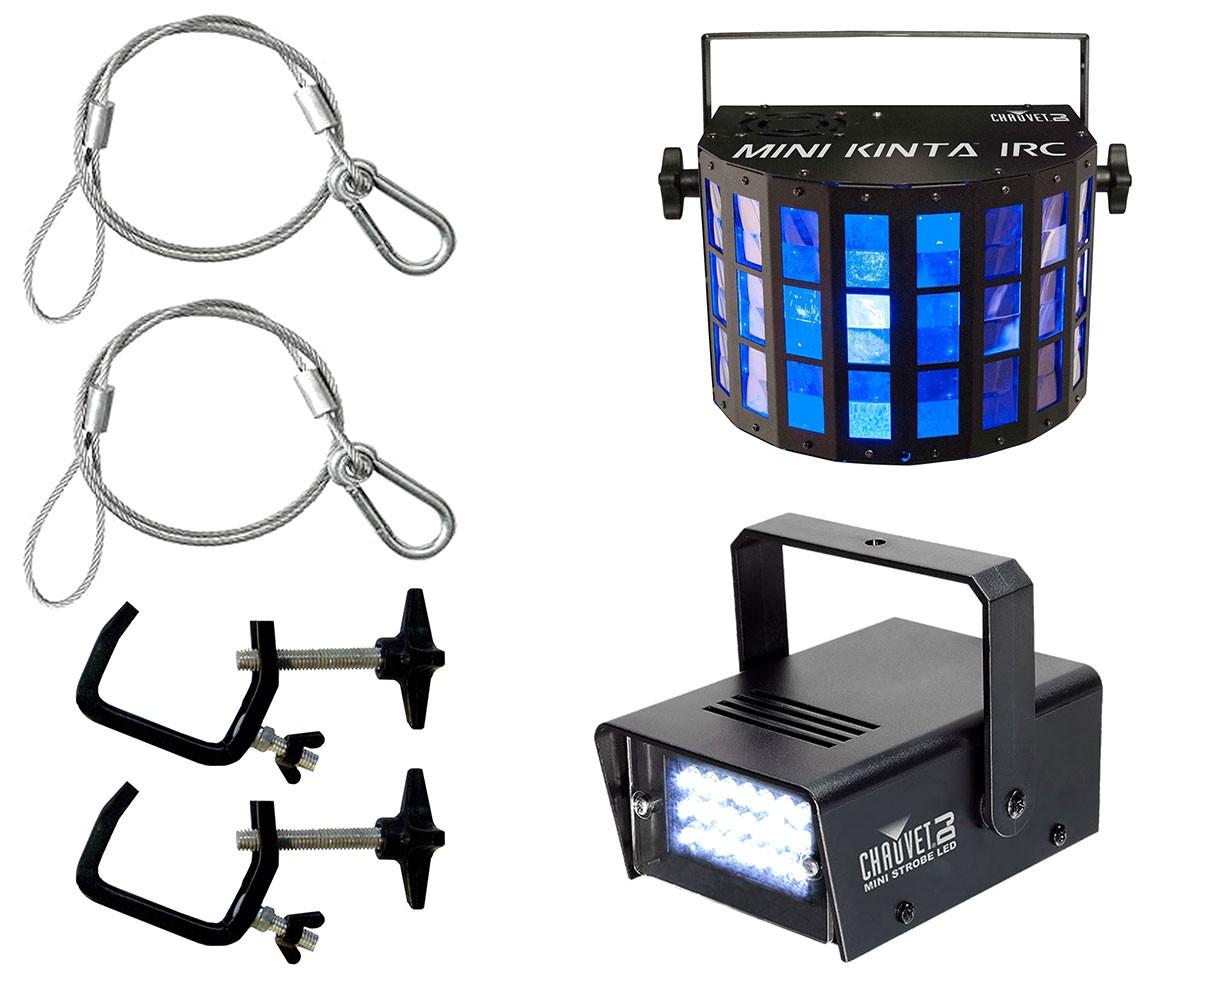 CHAUVET DJ Mini Kinta IRC + Strobe Light + Clamps + Safety